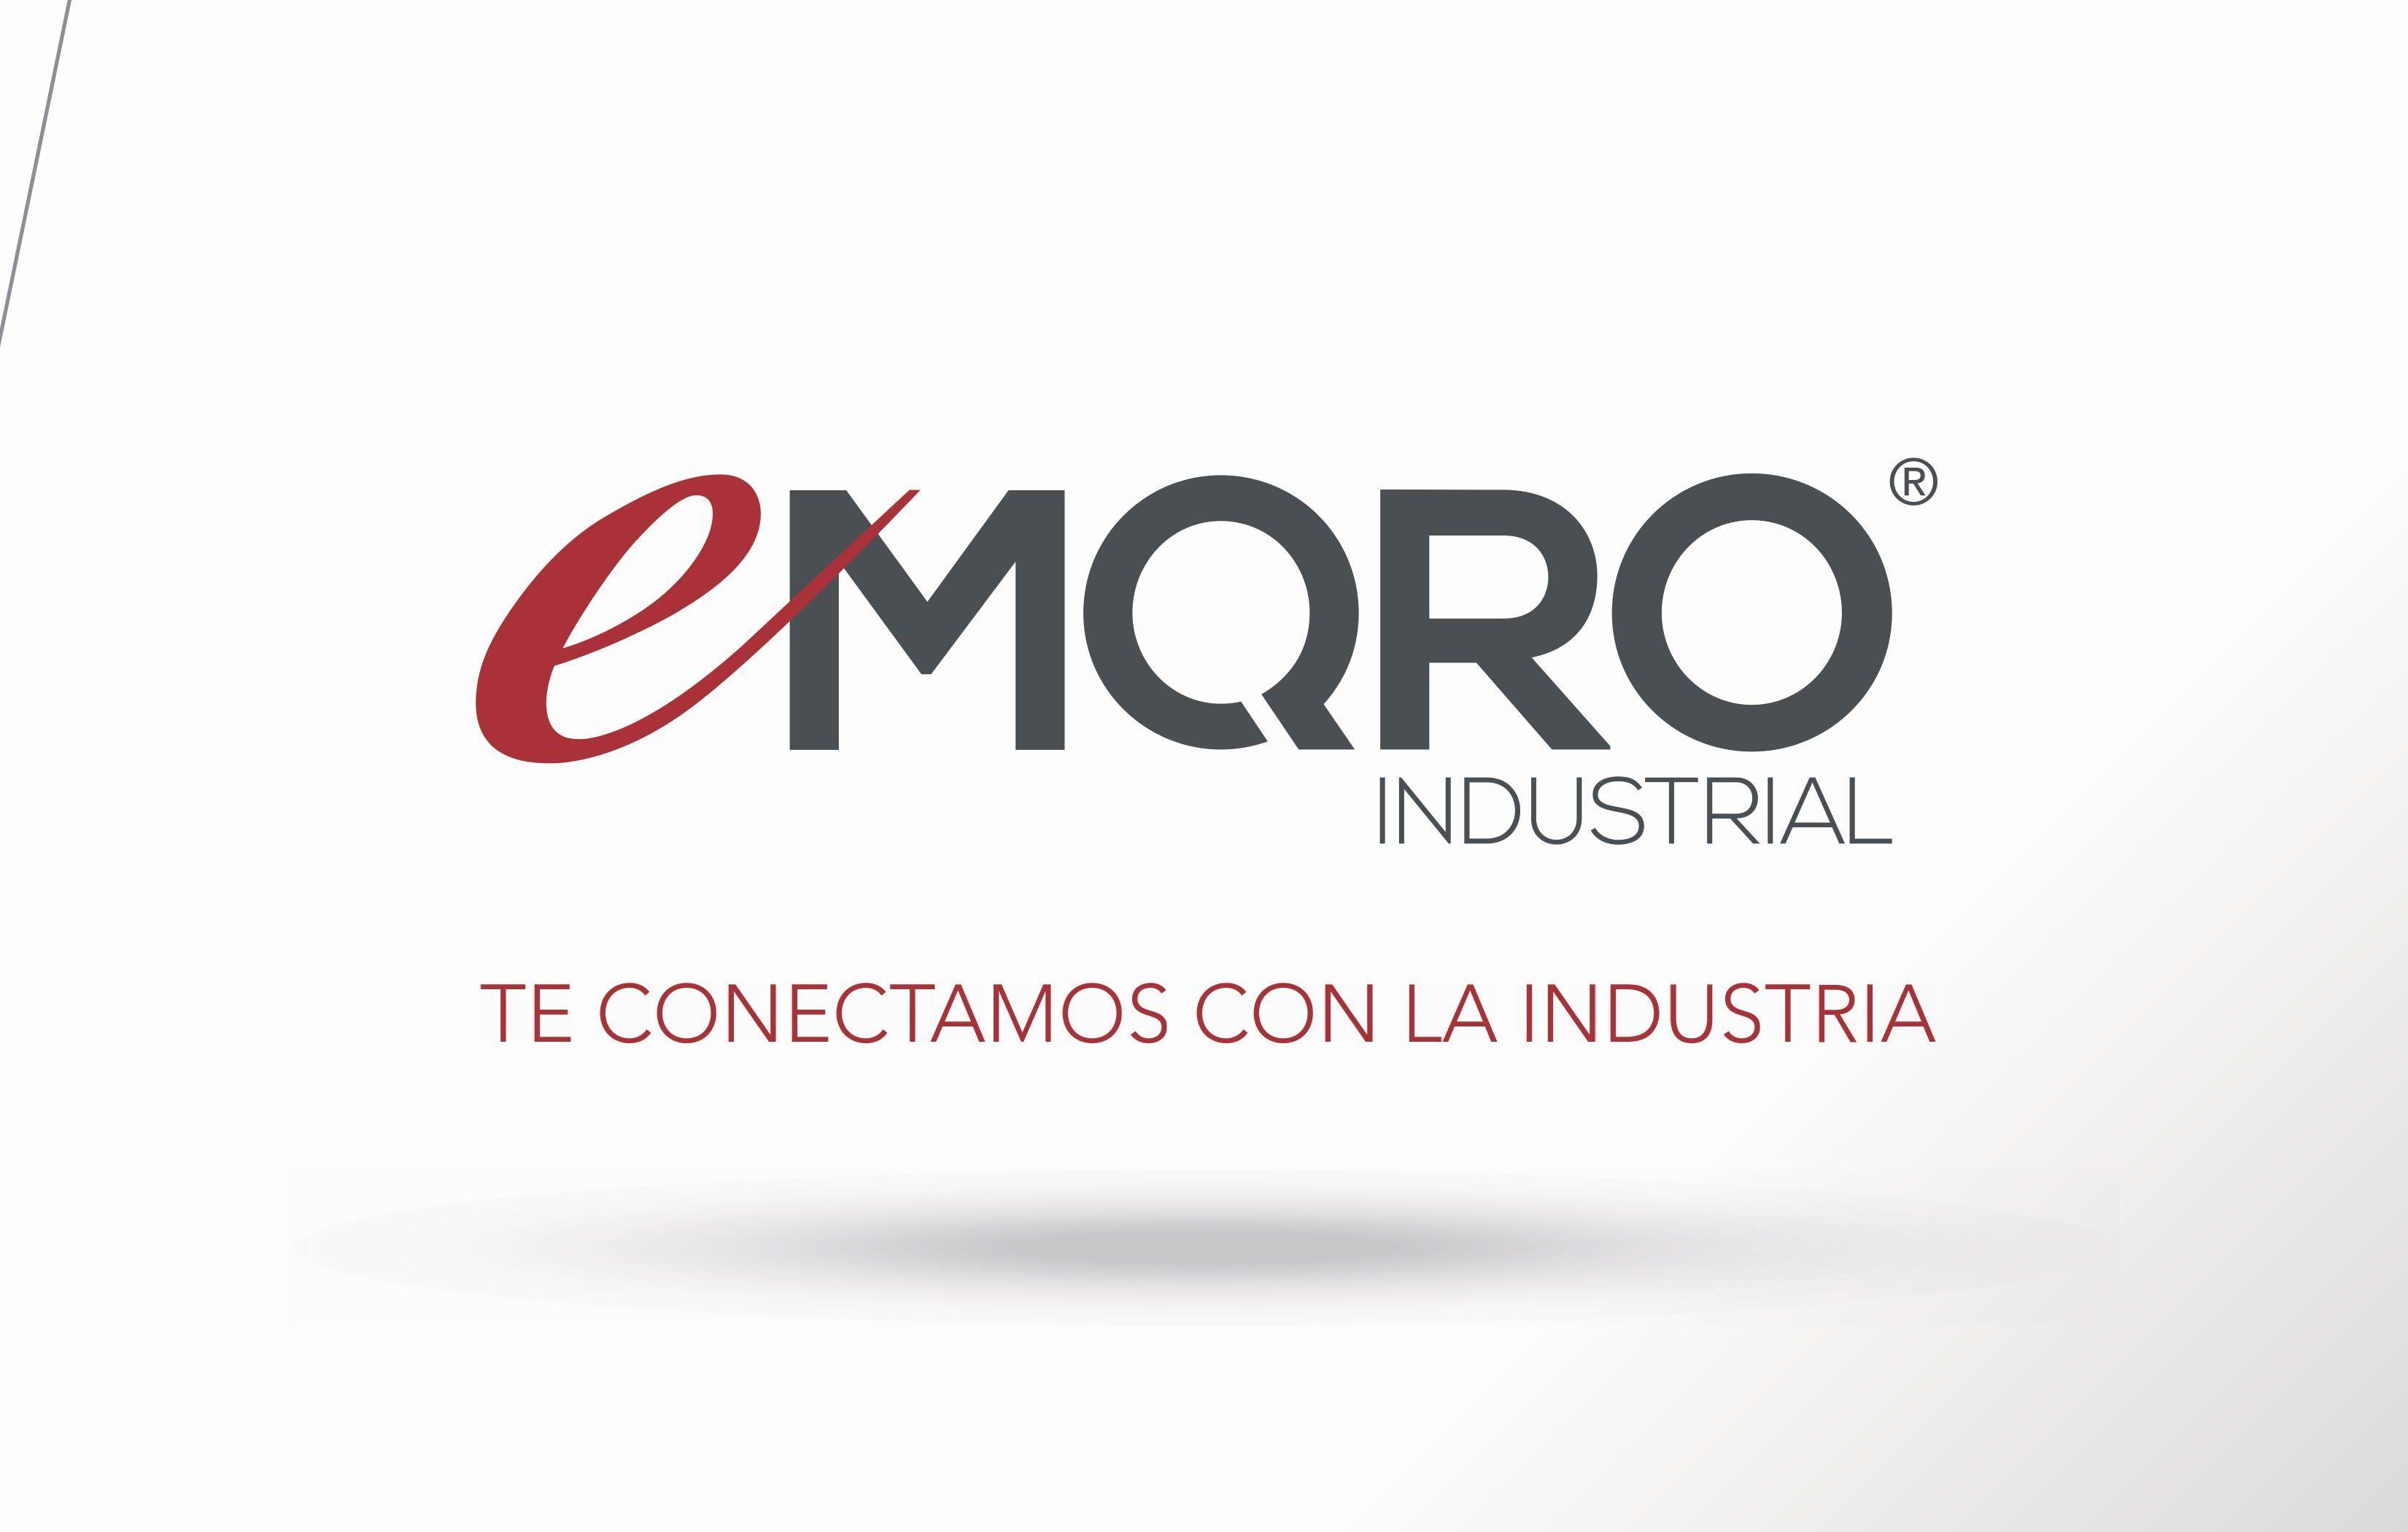 EmqroIndustrial